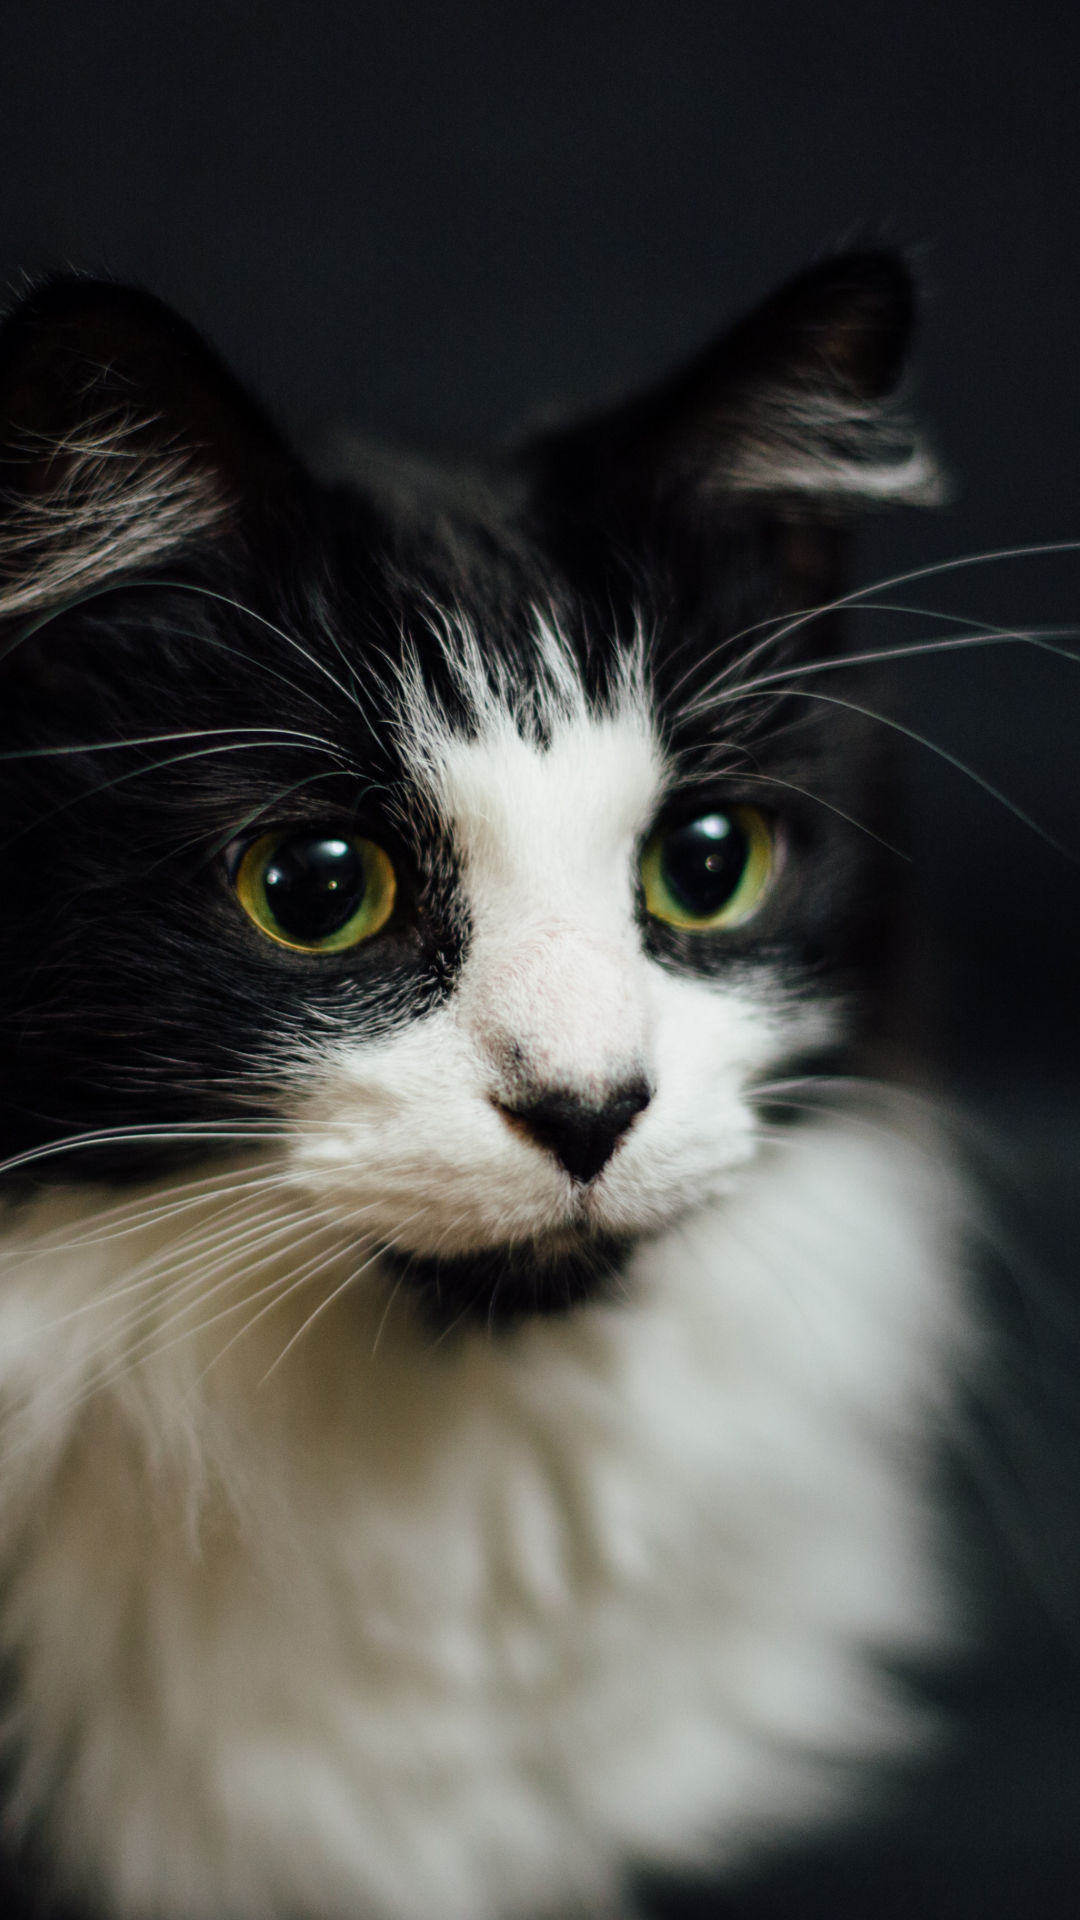 White And Black Cat Iphone Wallpaper Idrop News